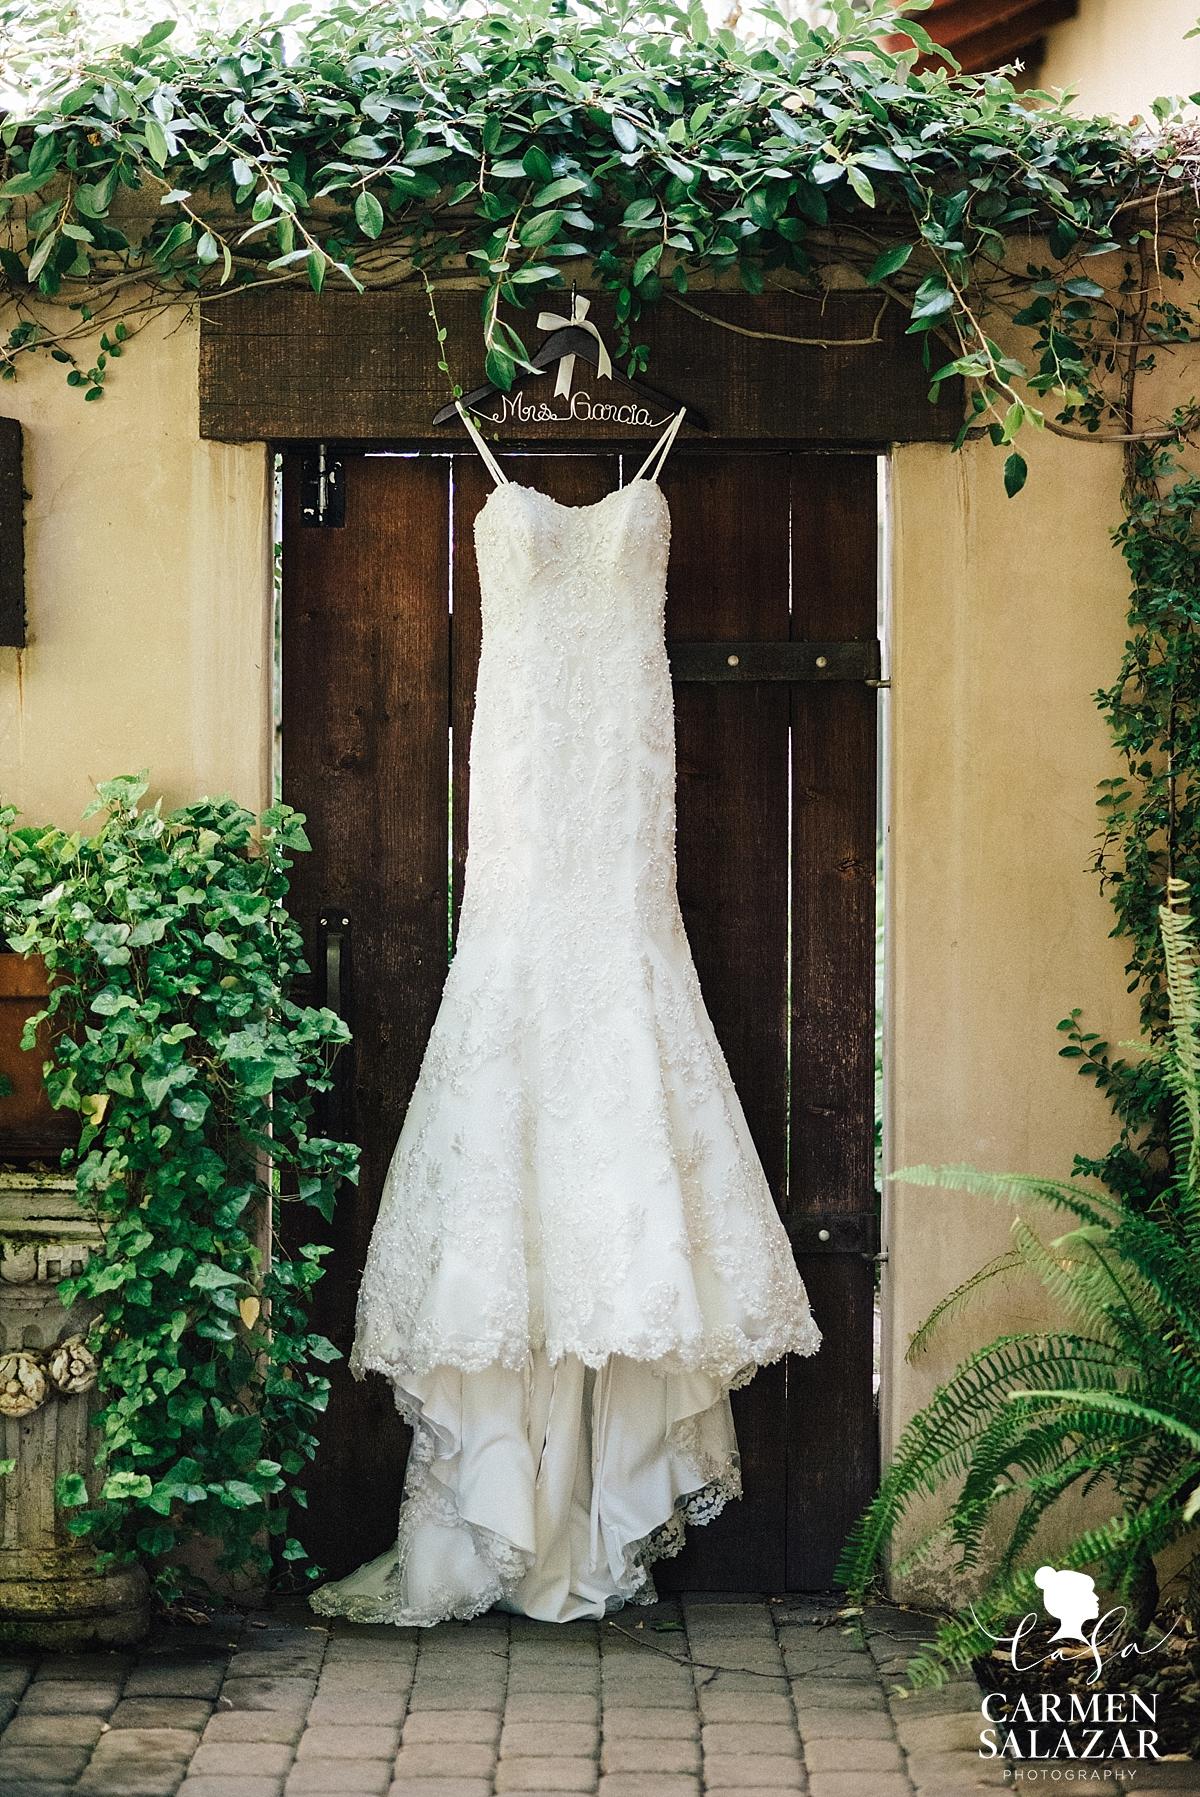 Glamorous lace mermaid wedding gown - Carmen Salazar